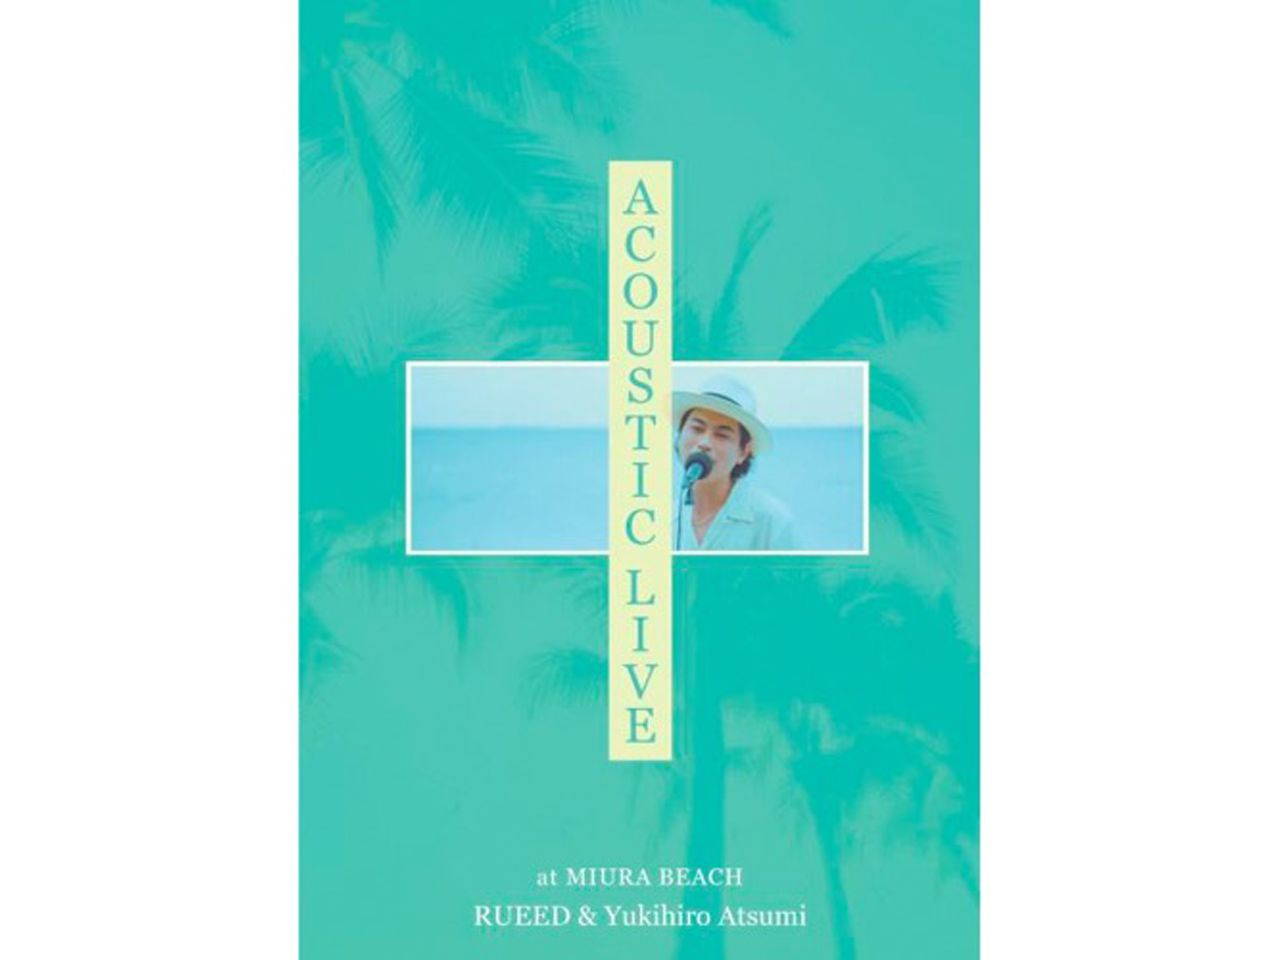 ACOUSTIC LIVE -RUEED & Yukihiro Atsumi-